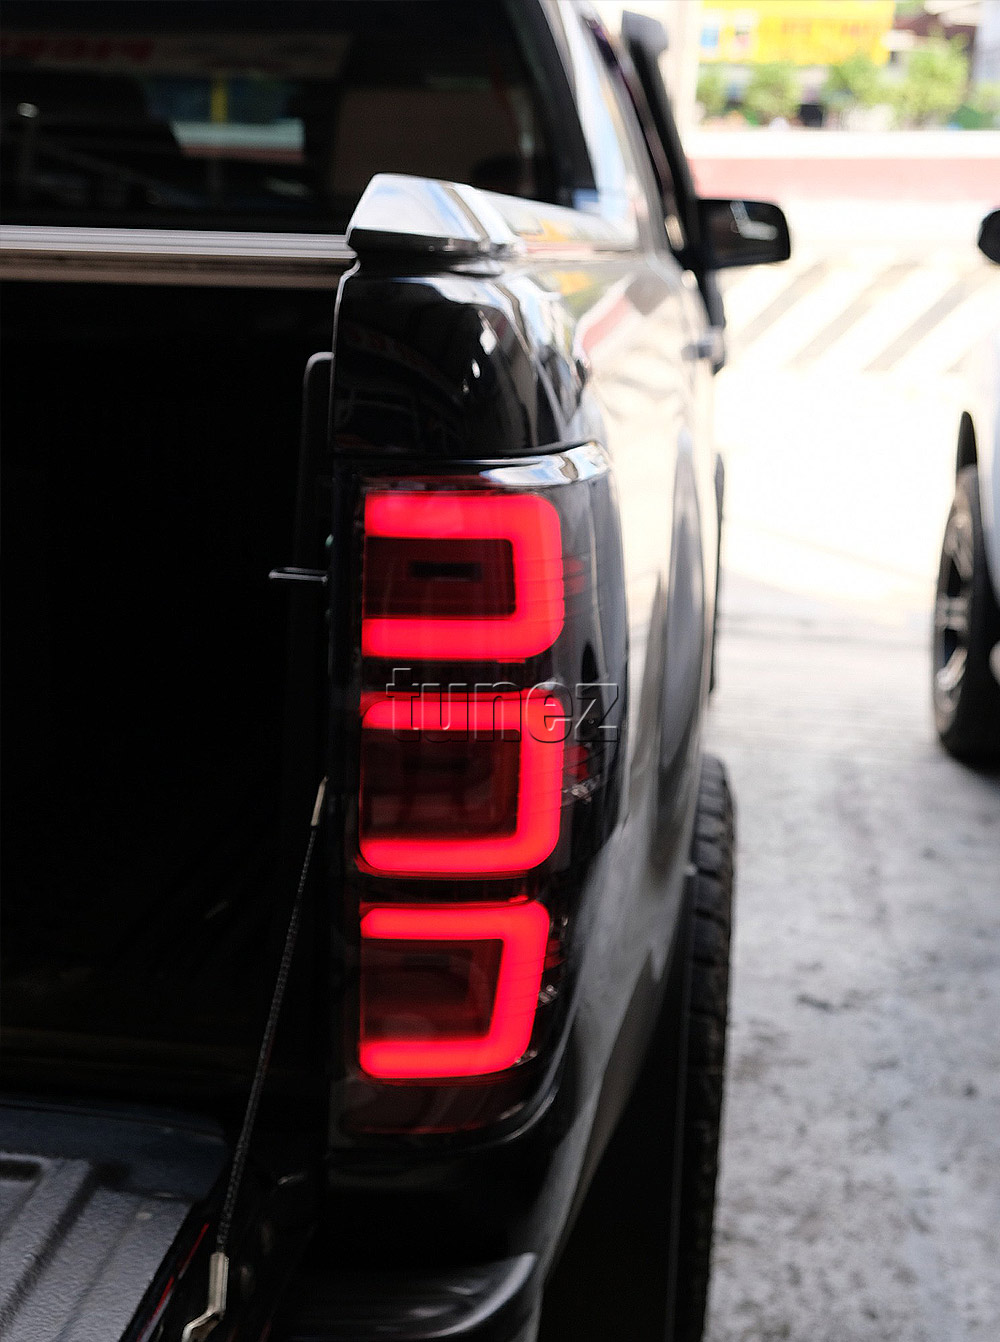 FRR12 Ford Ranger PX T6 Raptor Smoked Smoke Black Edition Styled Three U 3U Design LED Tail Rear Lamp Lights For Car Autotunez Tunez Taillights Rear Light OEM Aftermarket Pair Set 2018 2019 2020 2021 OEM Manufacturer Premier Series 1-Year 12-month Warranty Style Look 2.0 Bi Turbo CDI Bi-Turbo